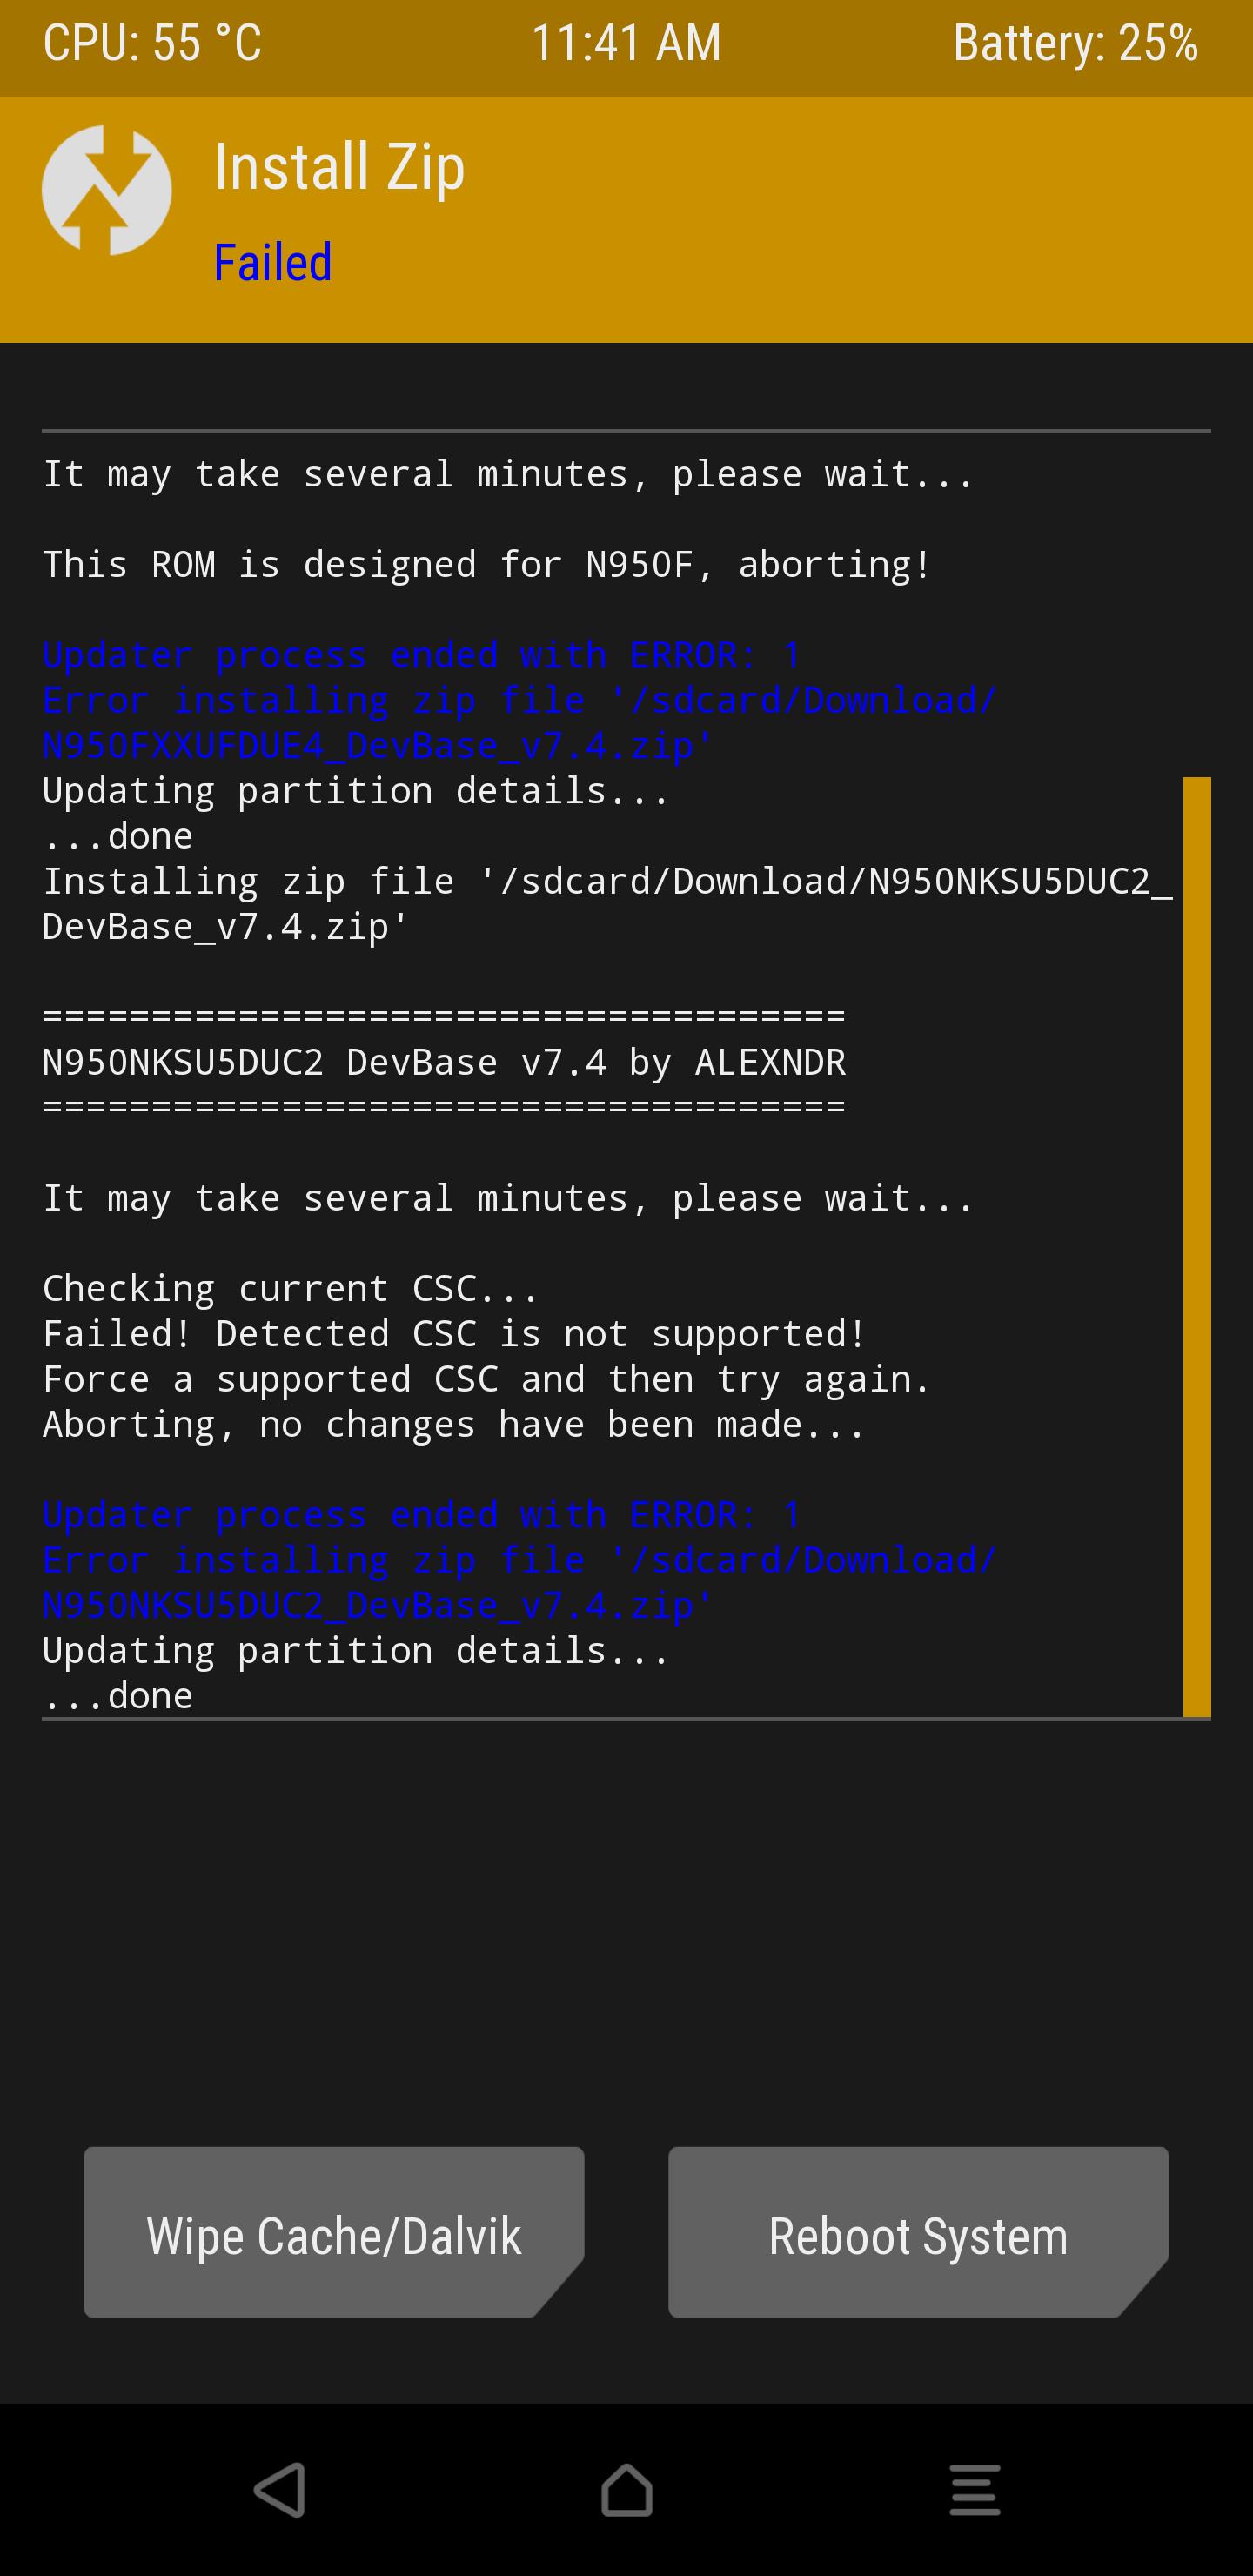 Screenshot_2021-06-10-11-41-18.png